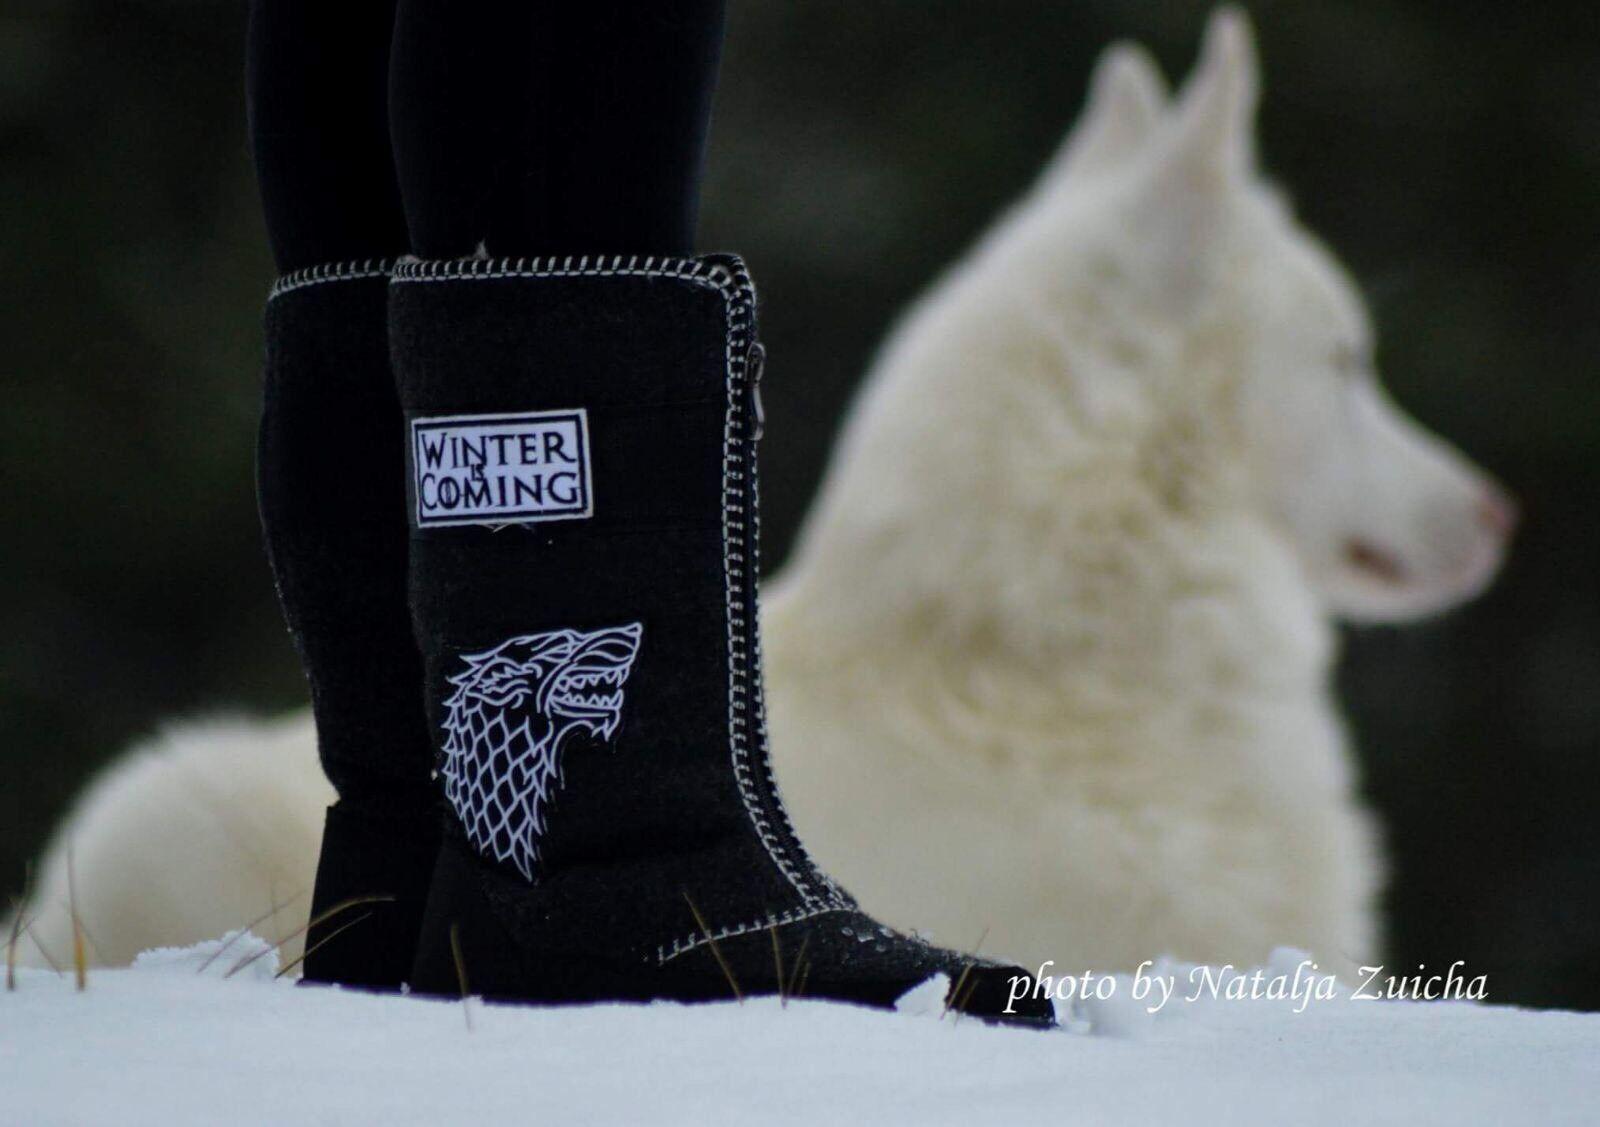 Game of of of Thrones walenki, invierno botas talla 38,39 c0278a